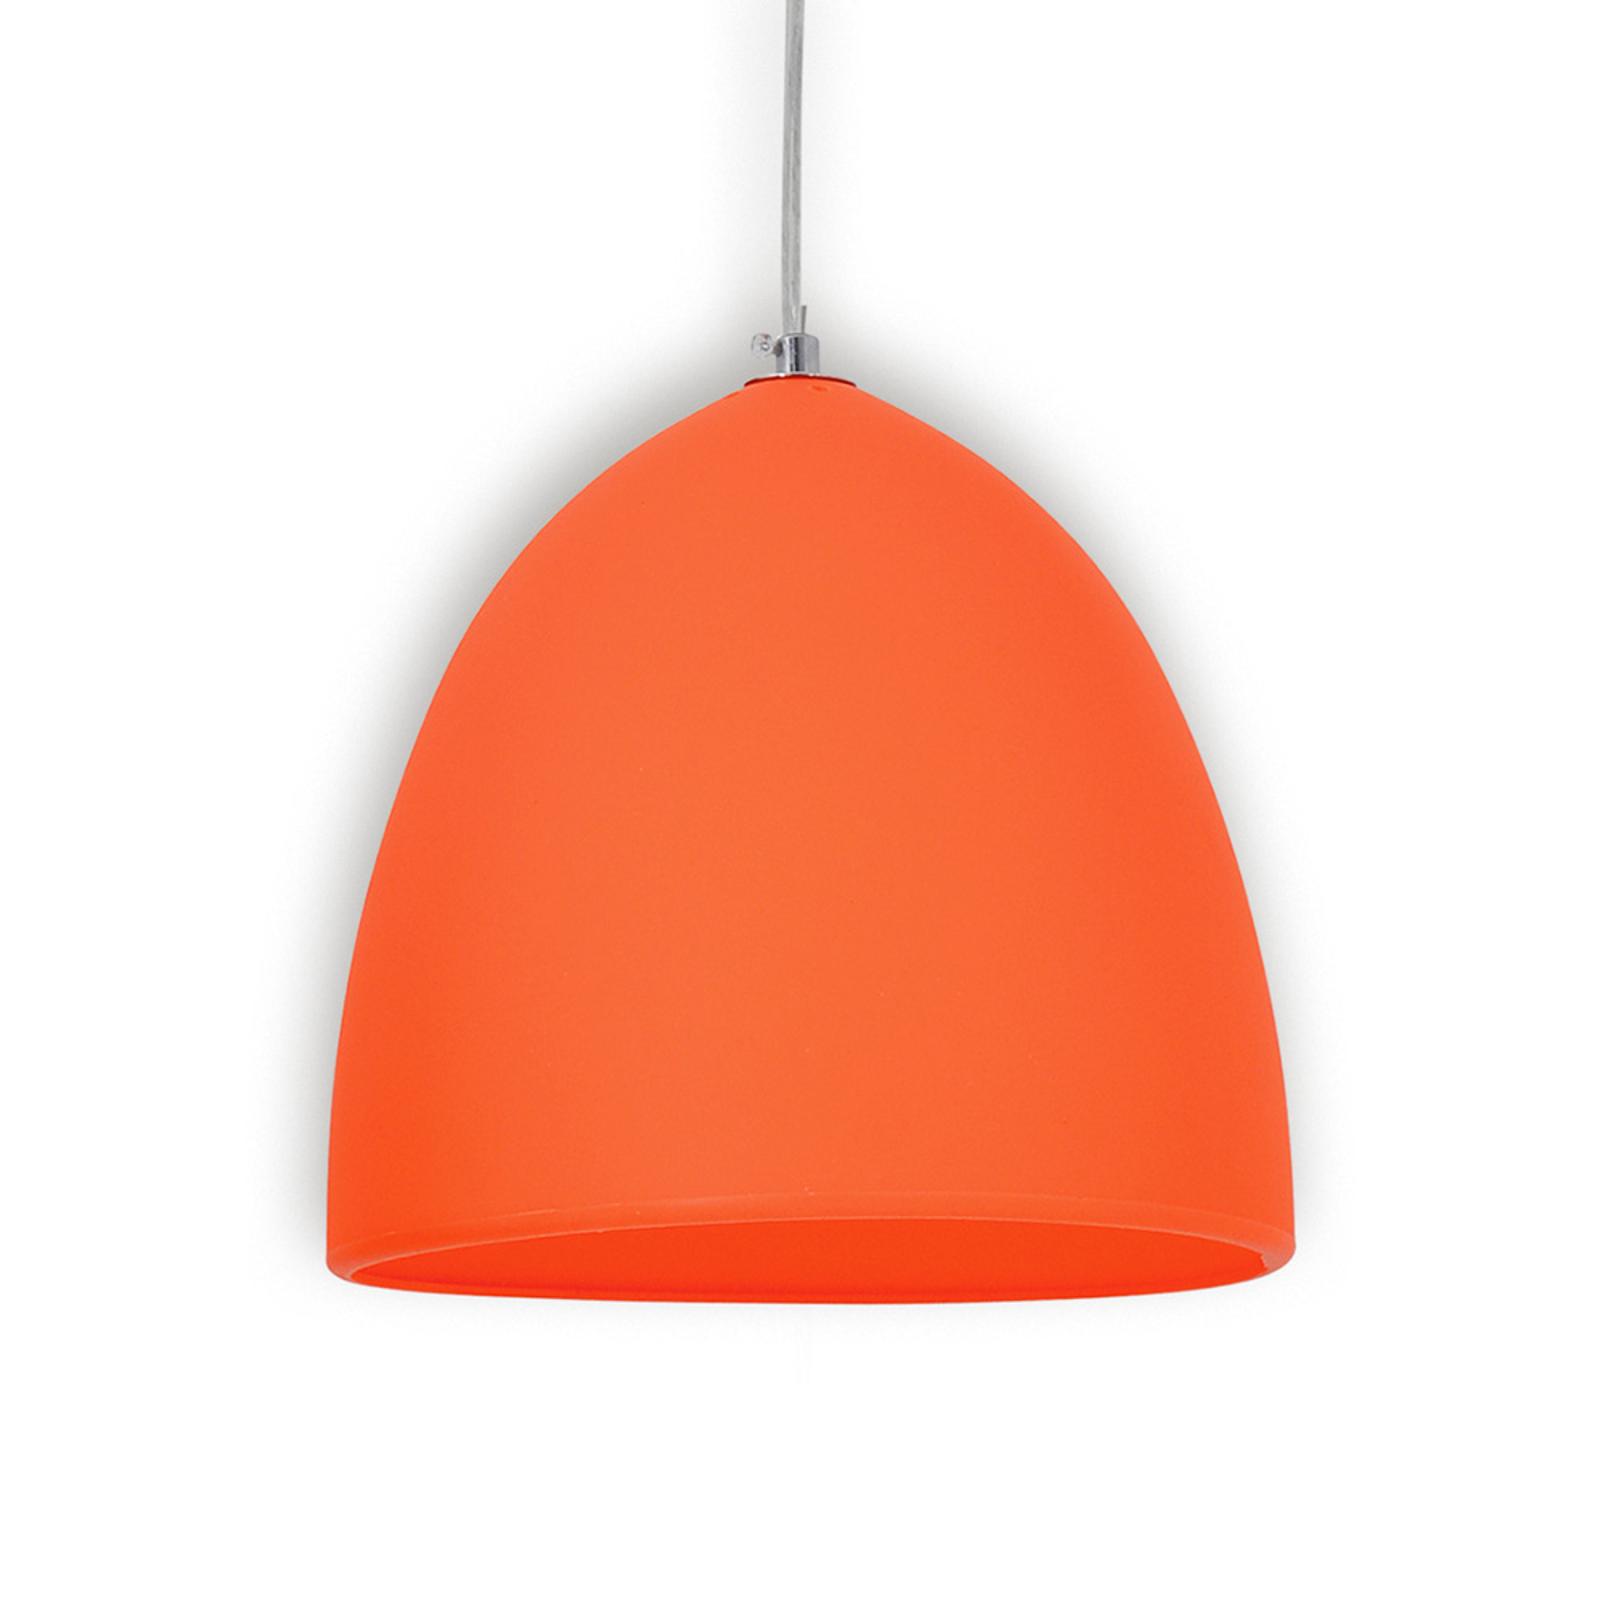 Orange silicon pendant light Fancy_7000784_1